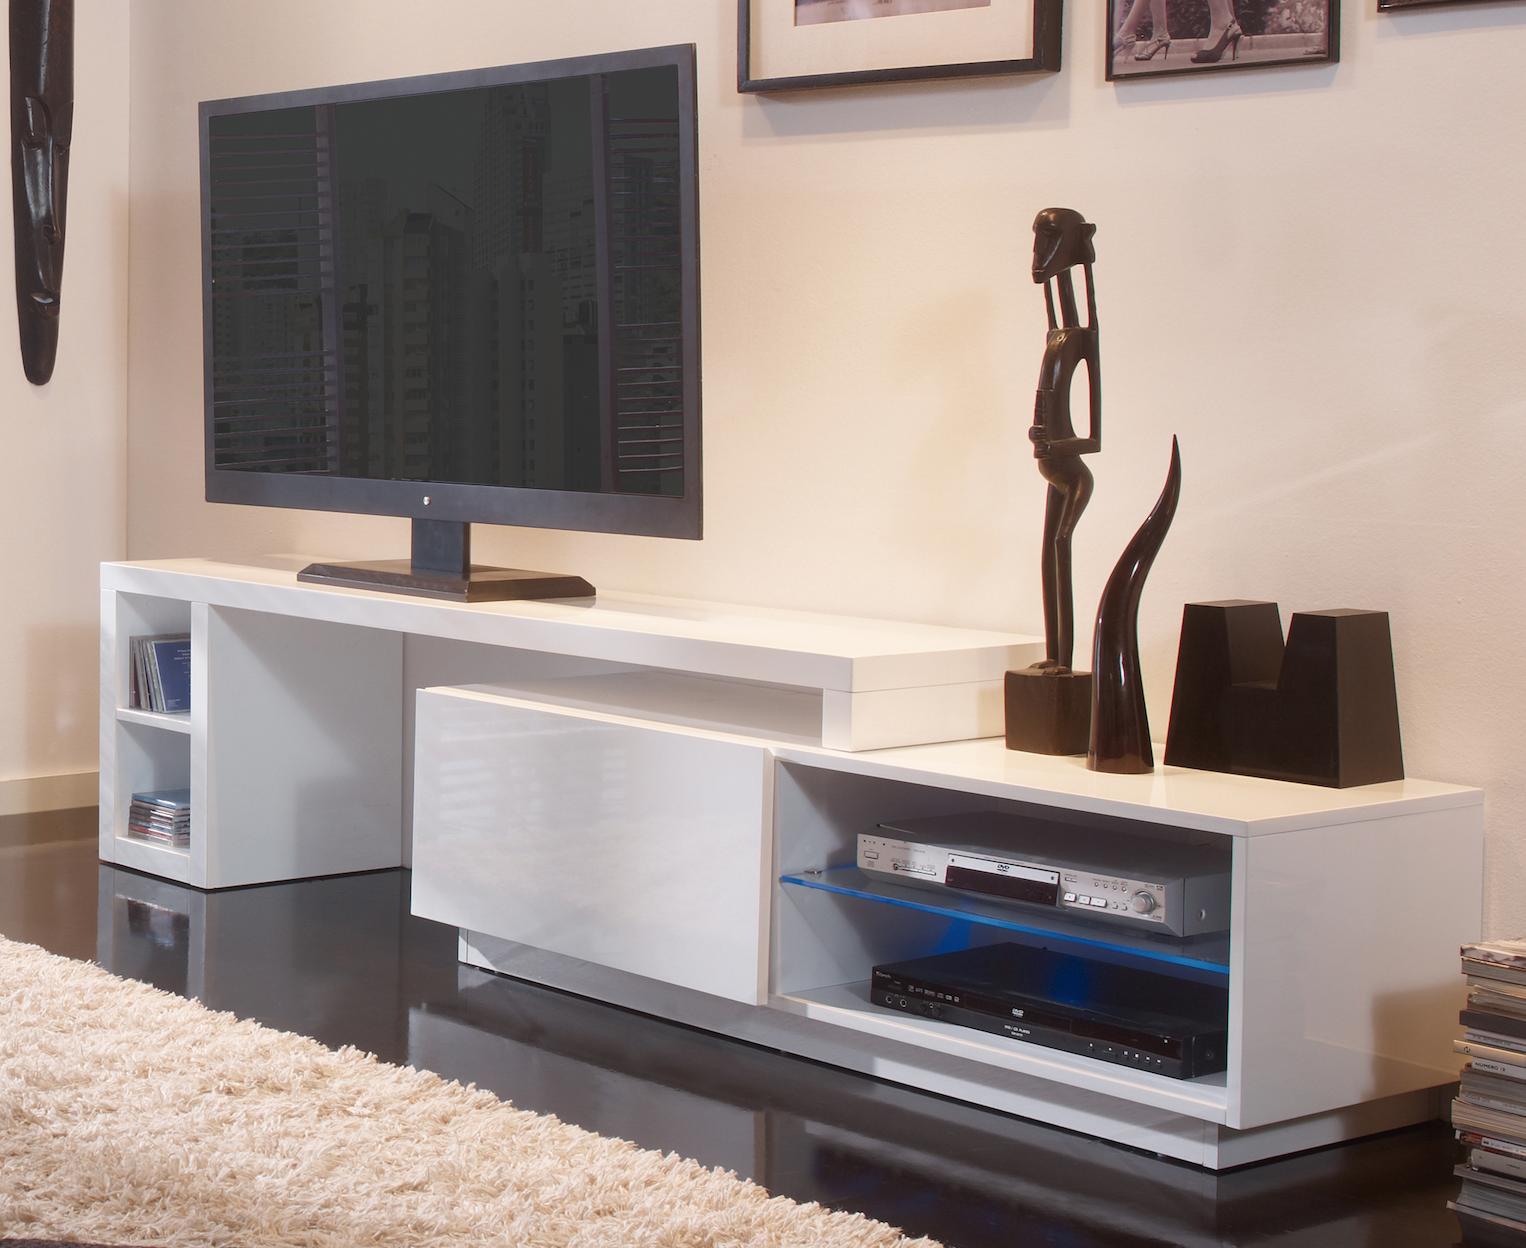 Meuble tv modulable led blanc laqu urban - Meuble tv a composer modulable ...